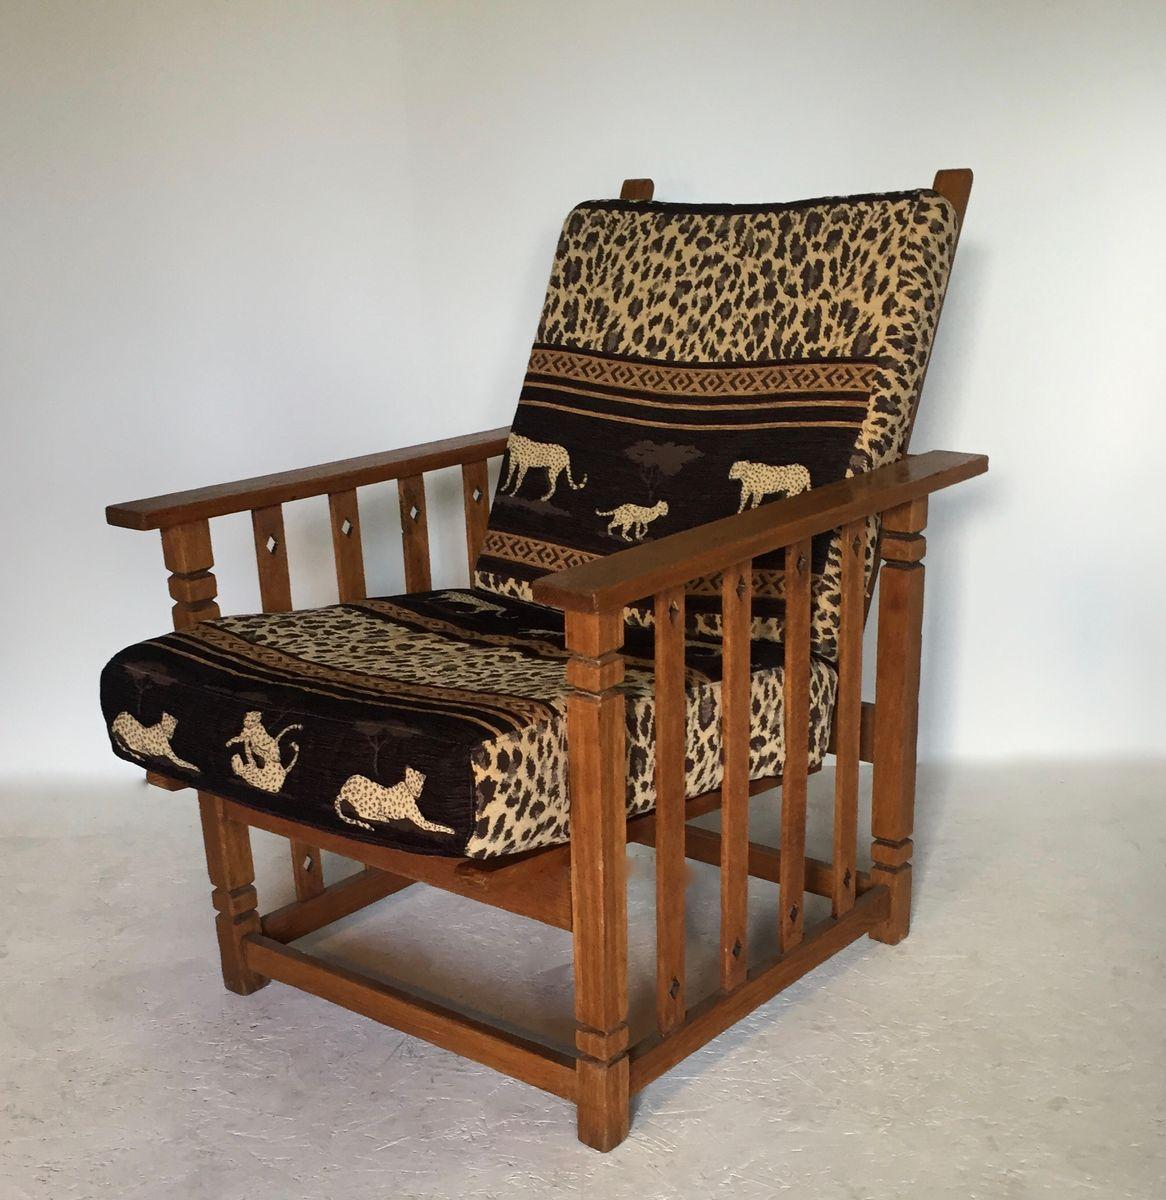 Sessel Aus Holz sessel aus hellem holz 1950er bei pamono kaufen